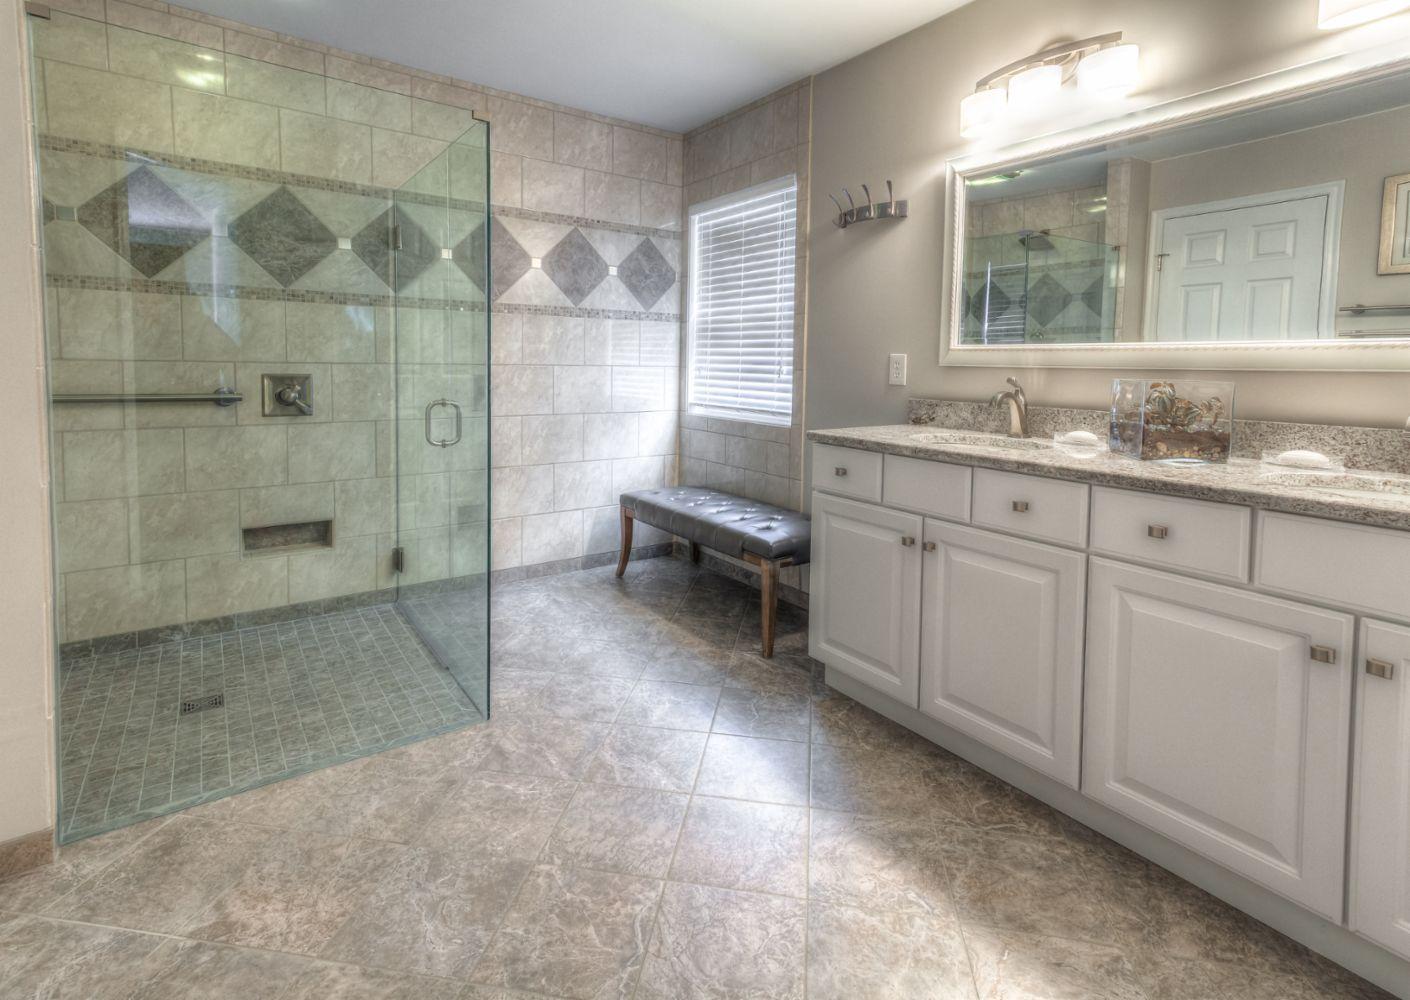 Bathroom Remodeling Cincinnati kitchen & bathroom remodeling in cincinnati, oh - lou vaughn